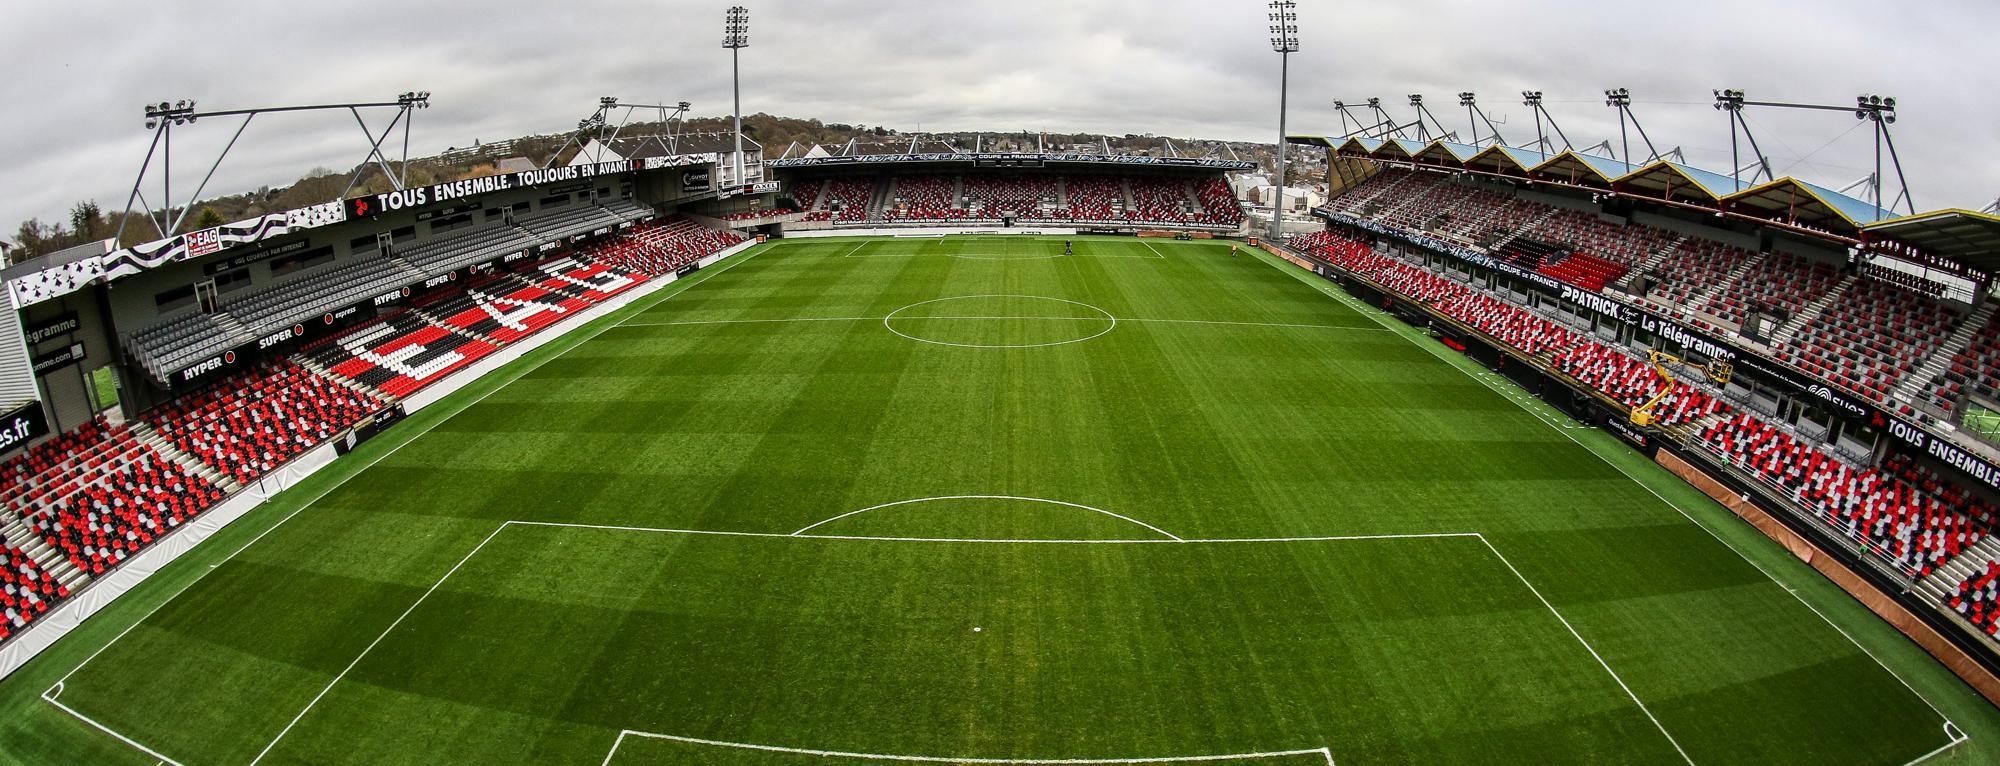 Image result for stade du roudourou